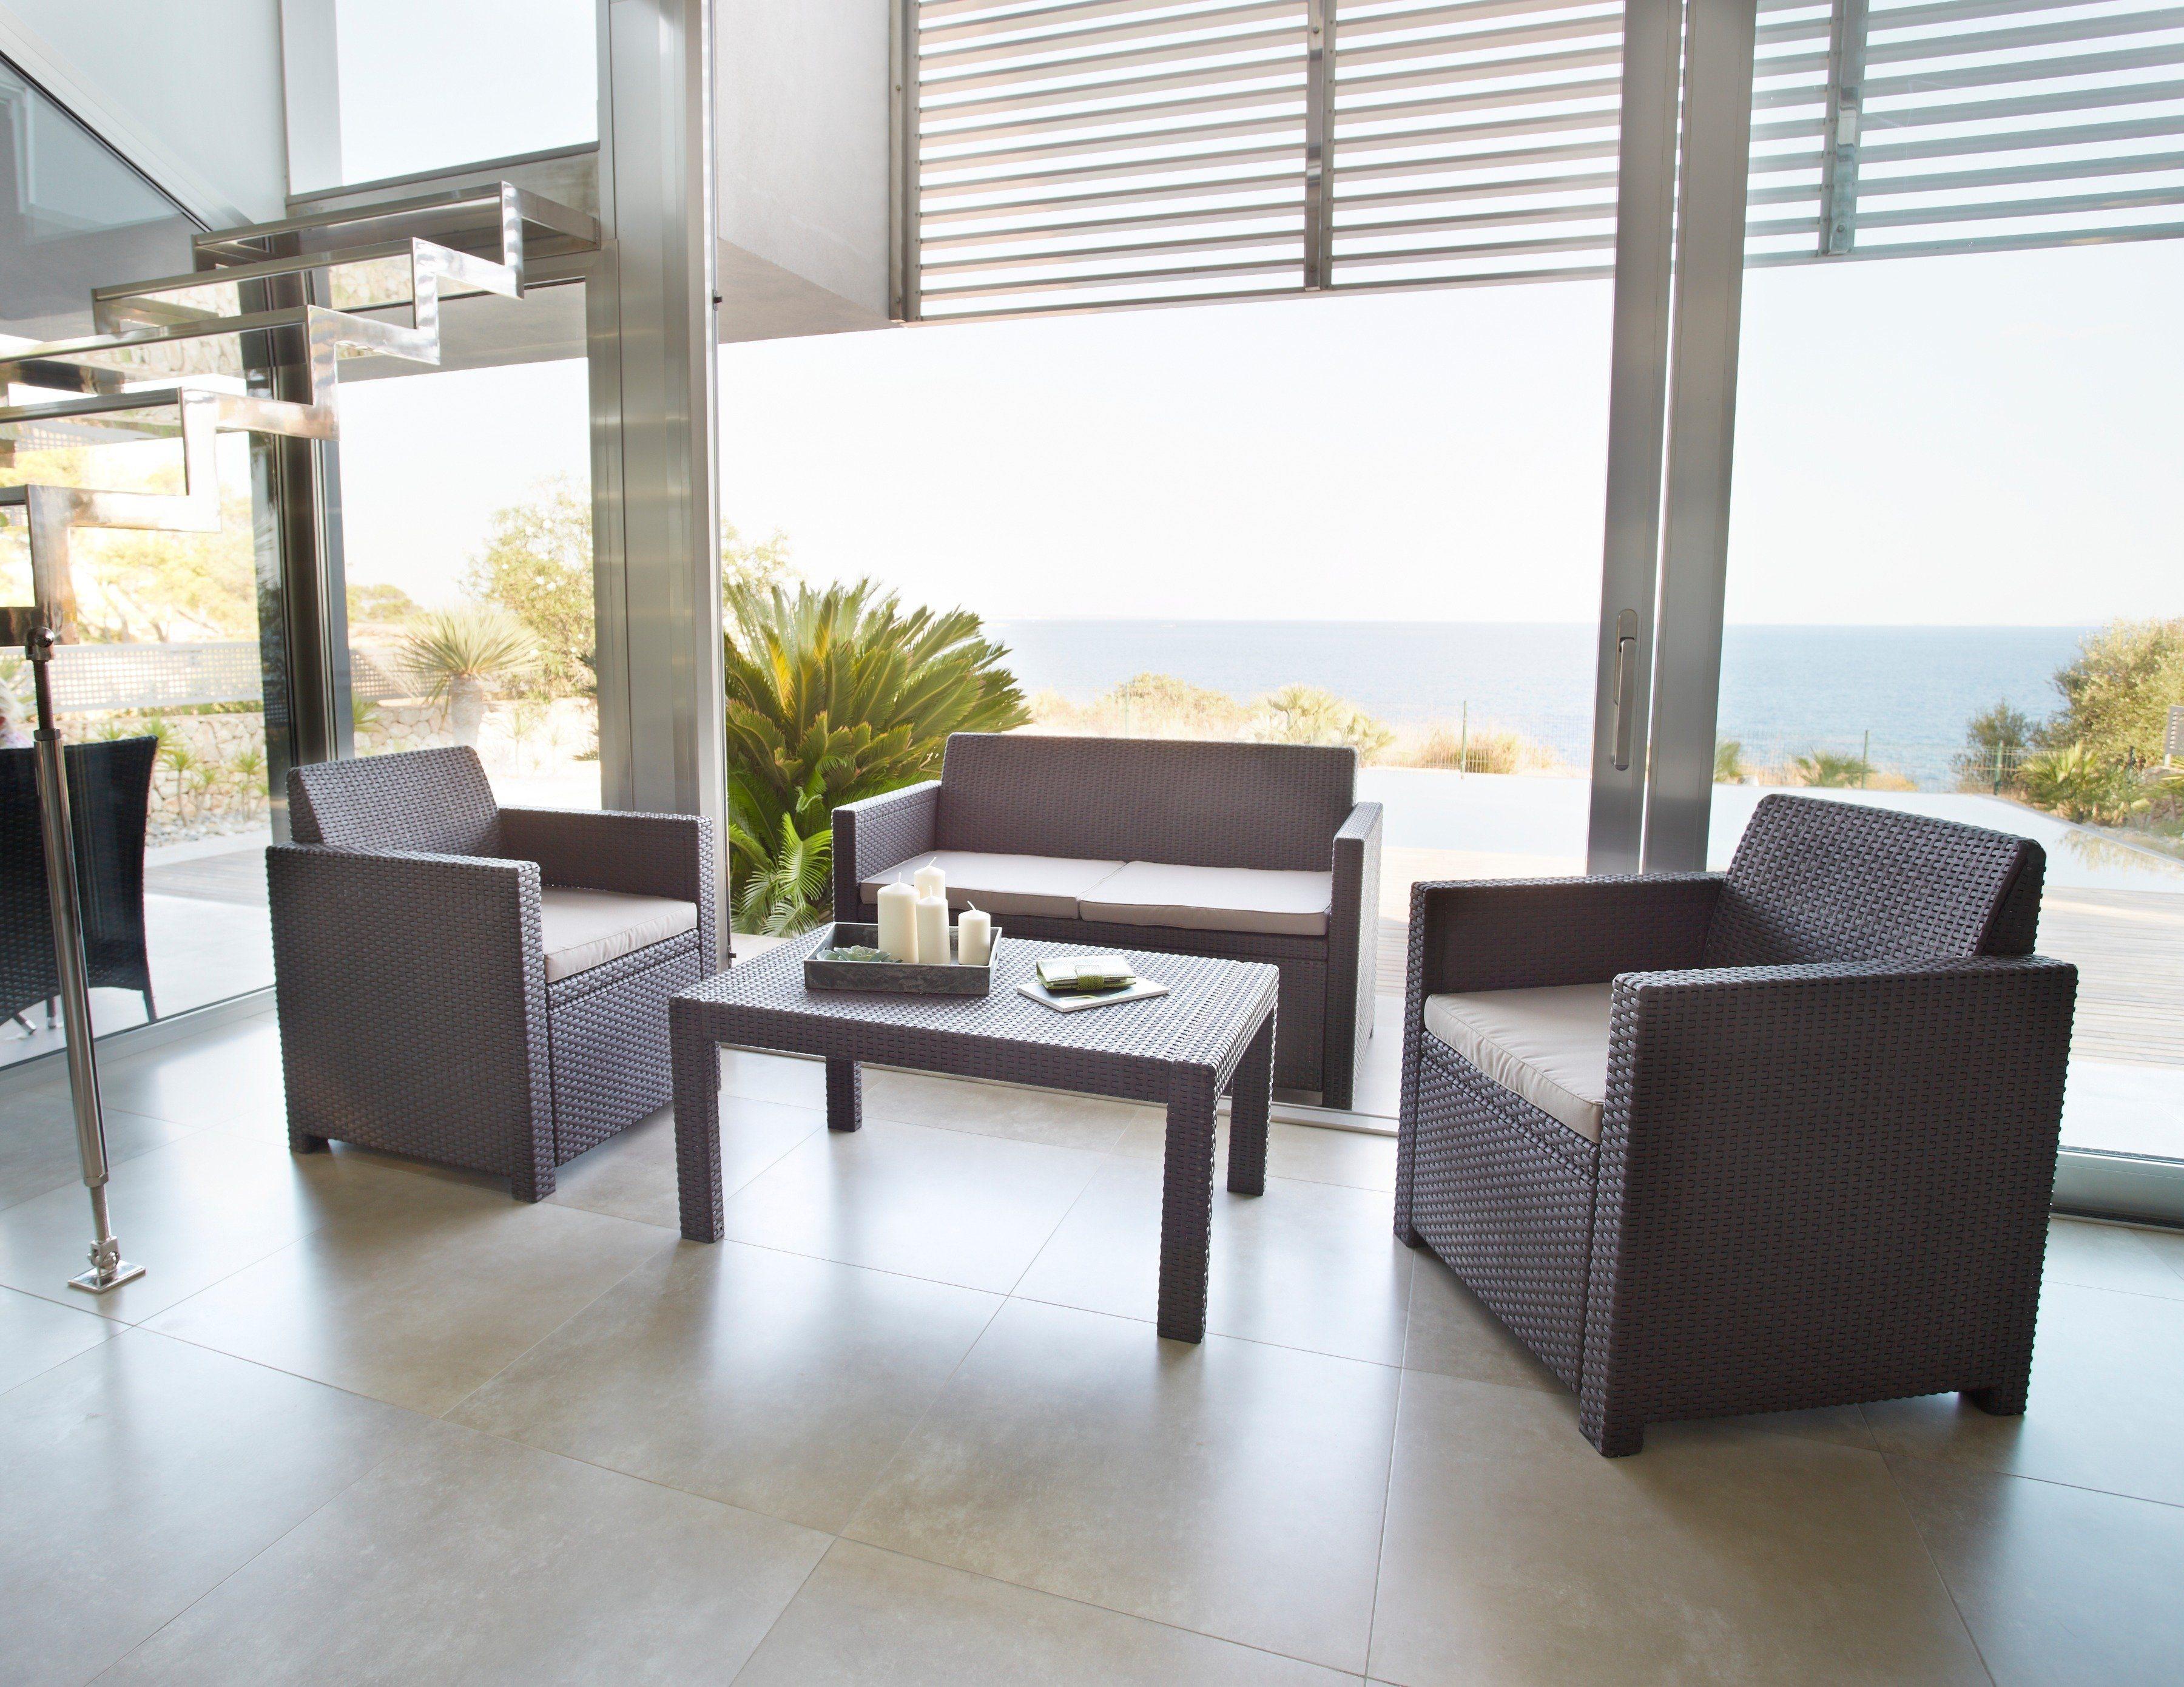 8-tlg. Loungeset »Merano«, 2er-Sofa, 2 Sessel, Tisch 91x48,5 cm, Kunststoff, braun